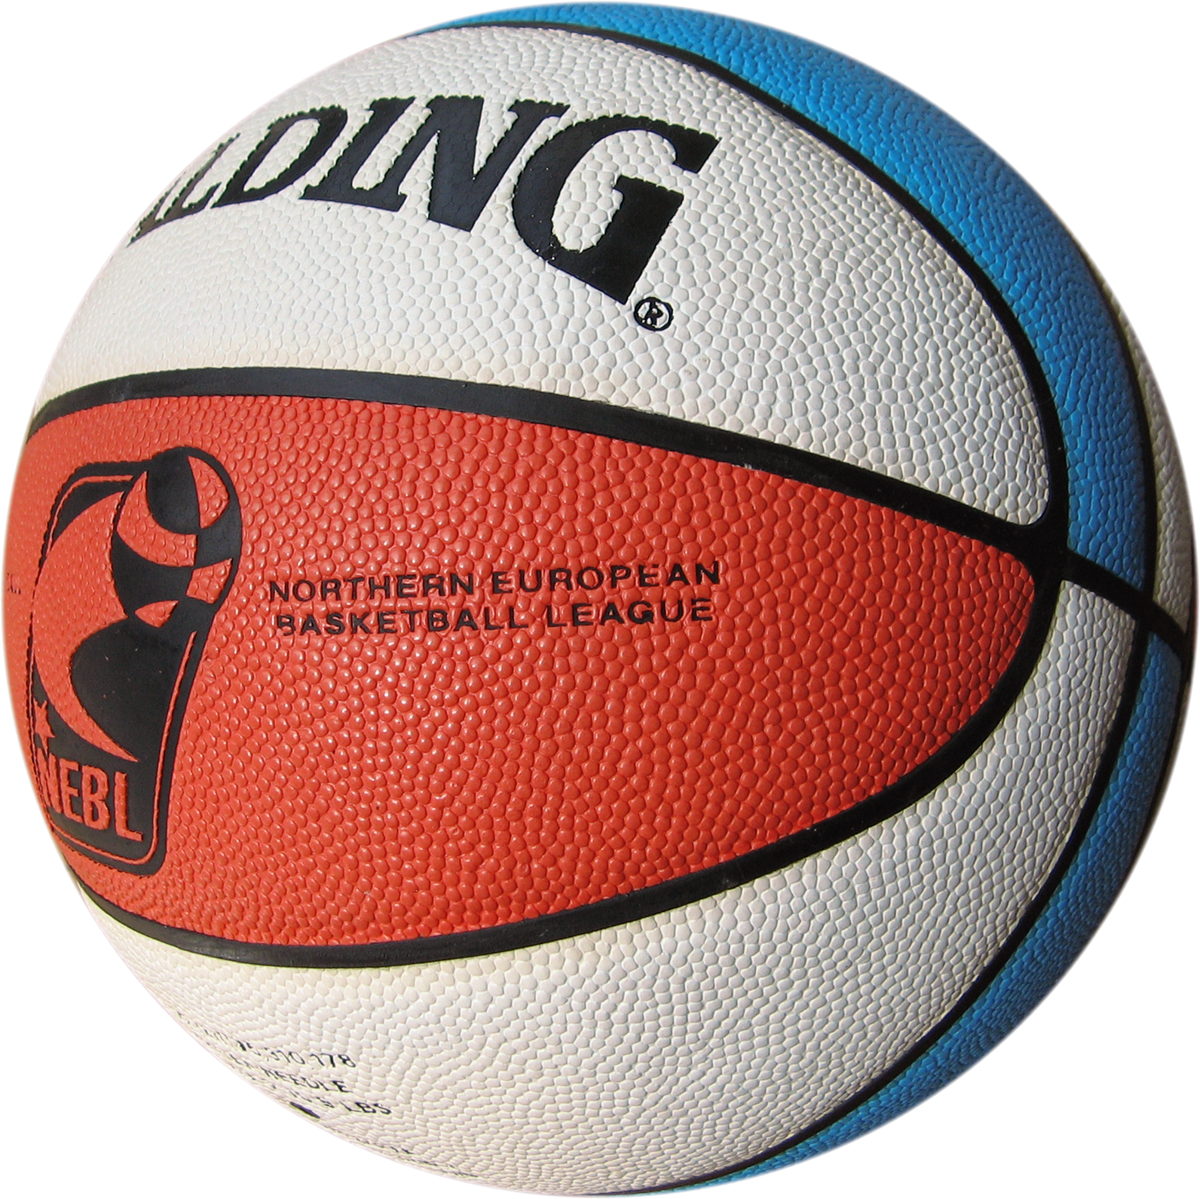 North European Basketball League - Wikipedia